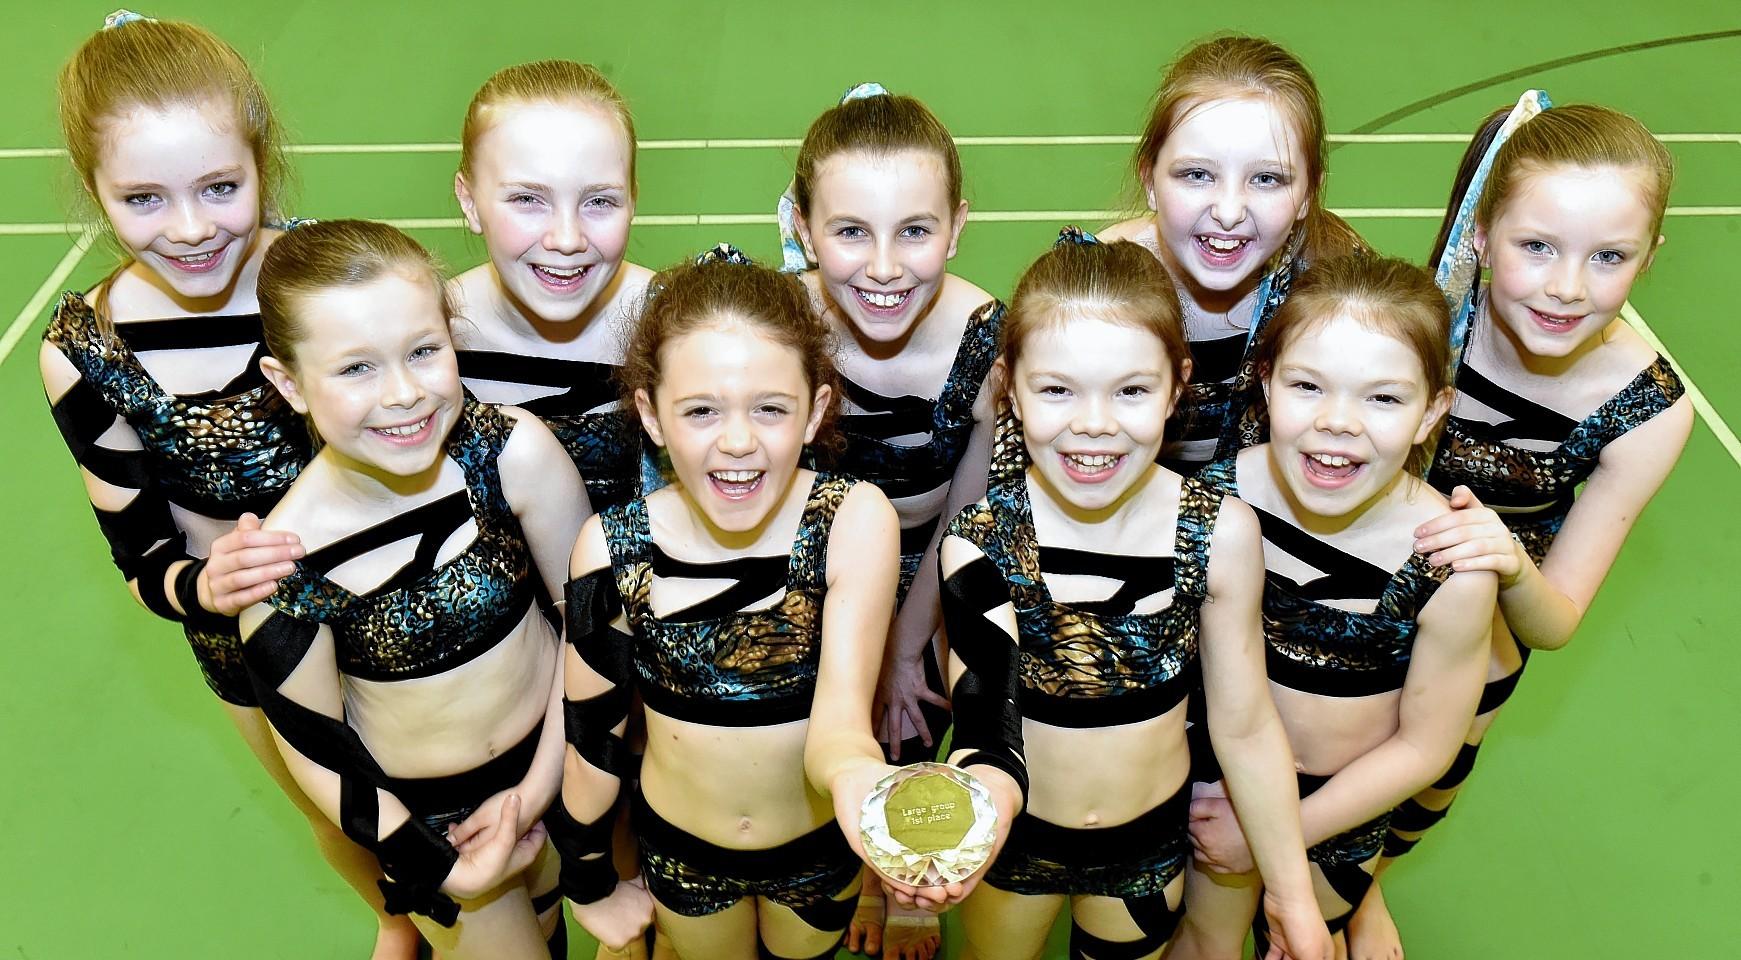 (back, from left) Grace Renforth, 10, Kate Duthie, 12, Hannah Alla, 12, Iona Leiper, 10, Hannah Cameron, 11(front, from left) Aimee Buchannan, 10, Mia Paoli, 10, Aimee Yule, 10 Abbie Yule, 10.